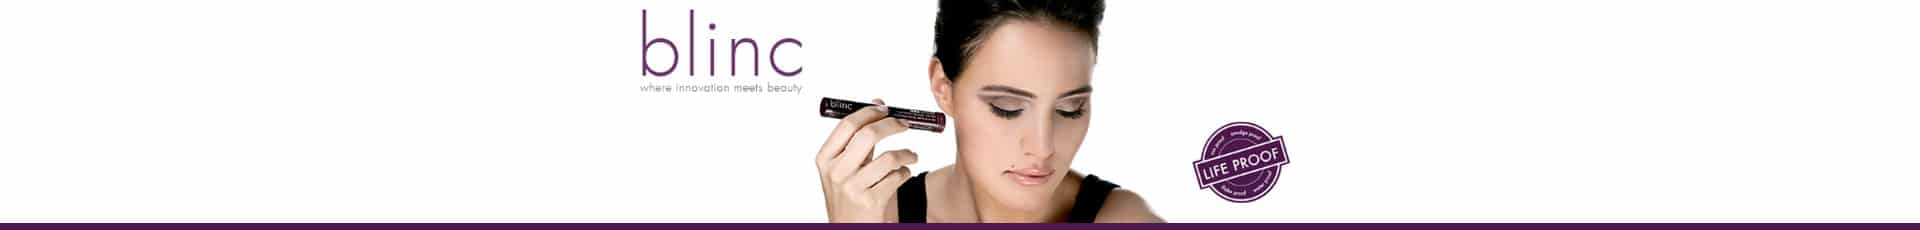 blinc Cosmetics